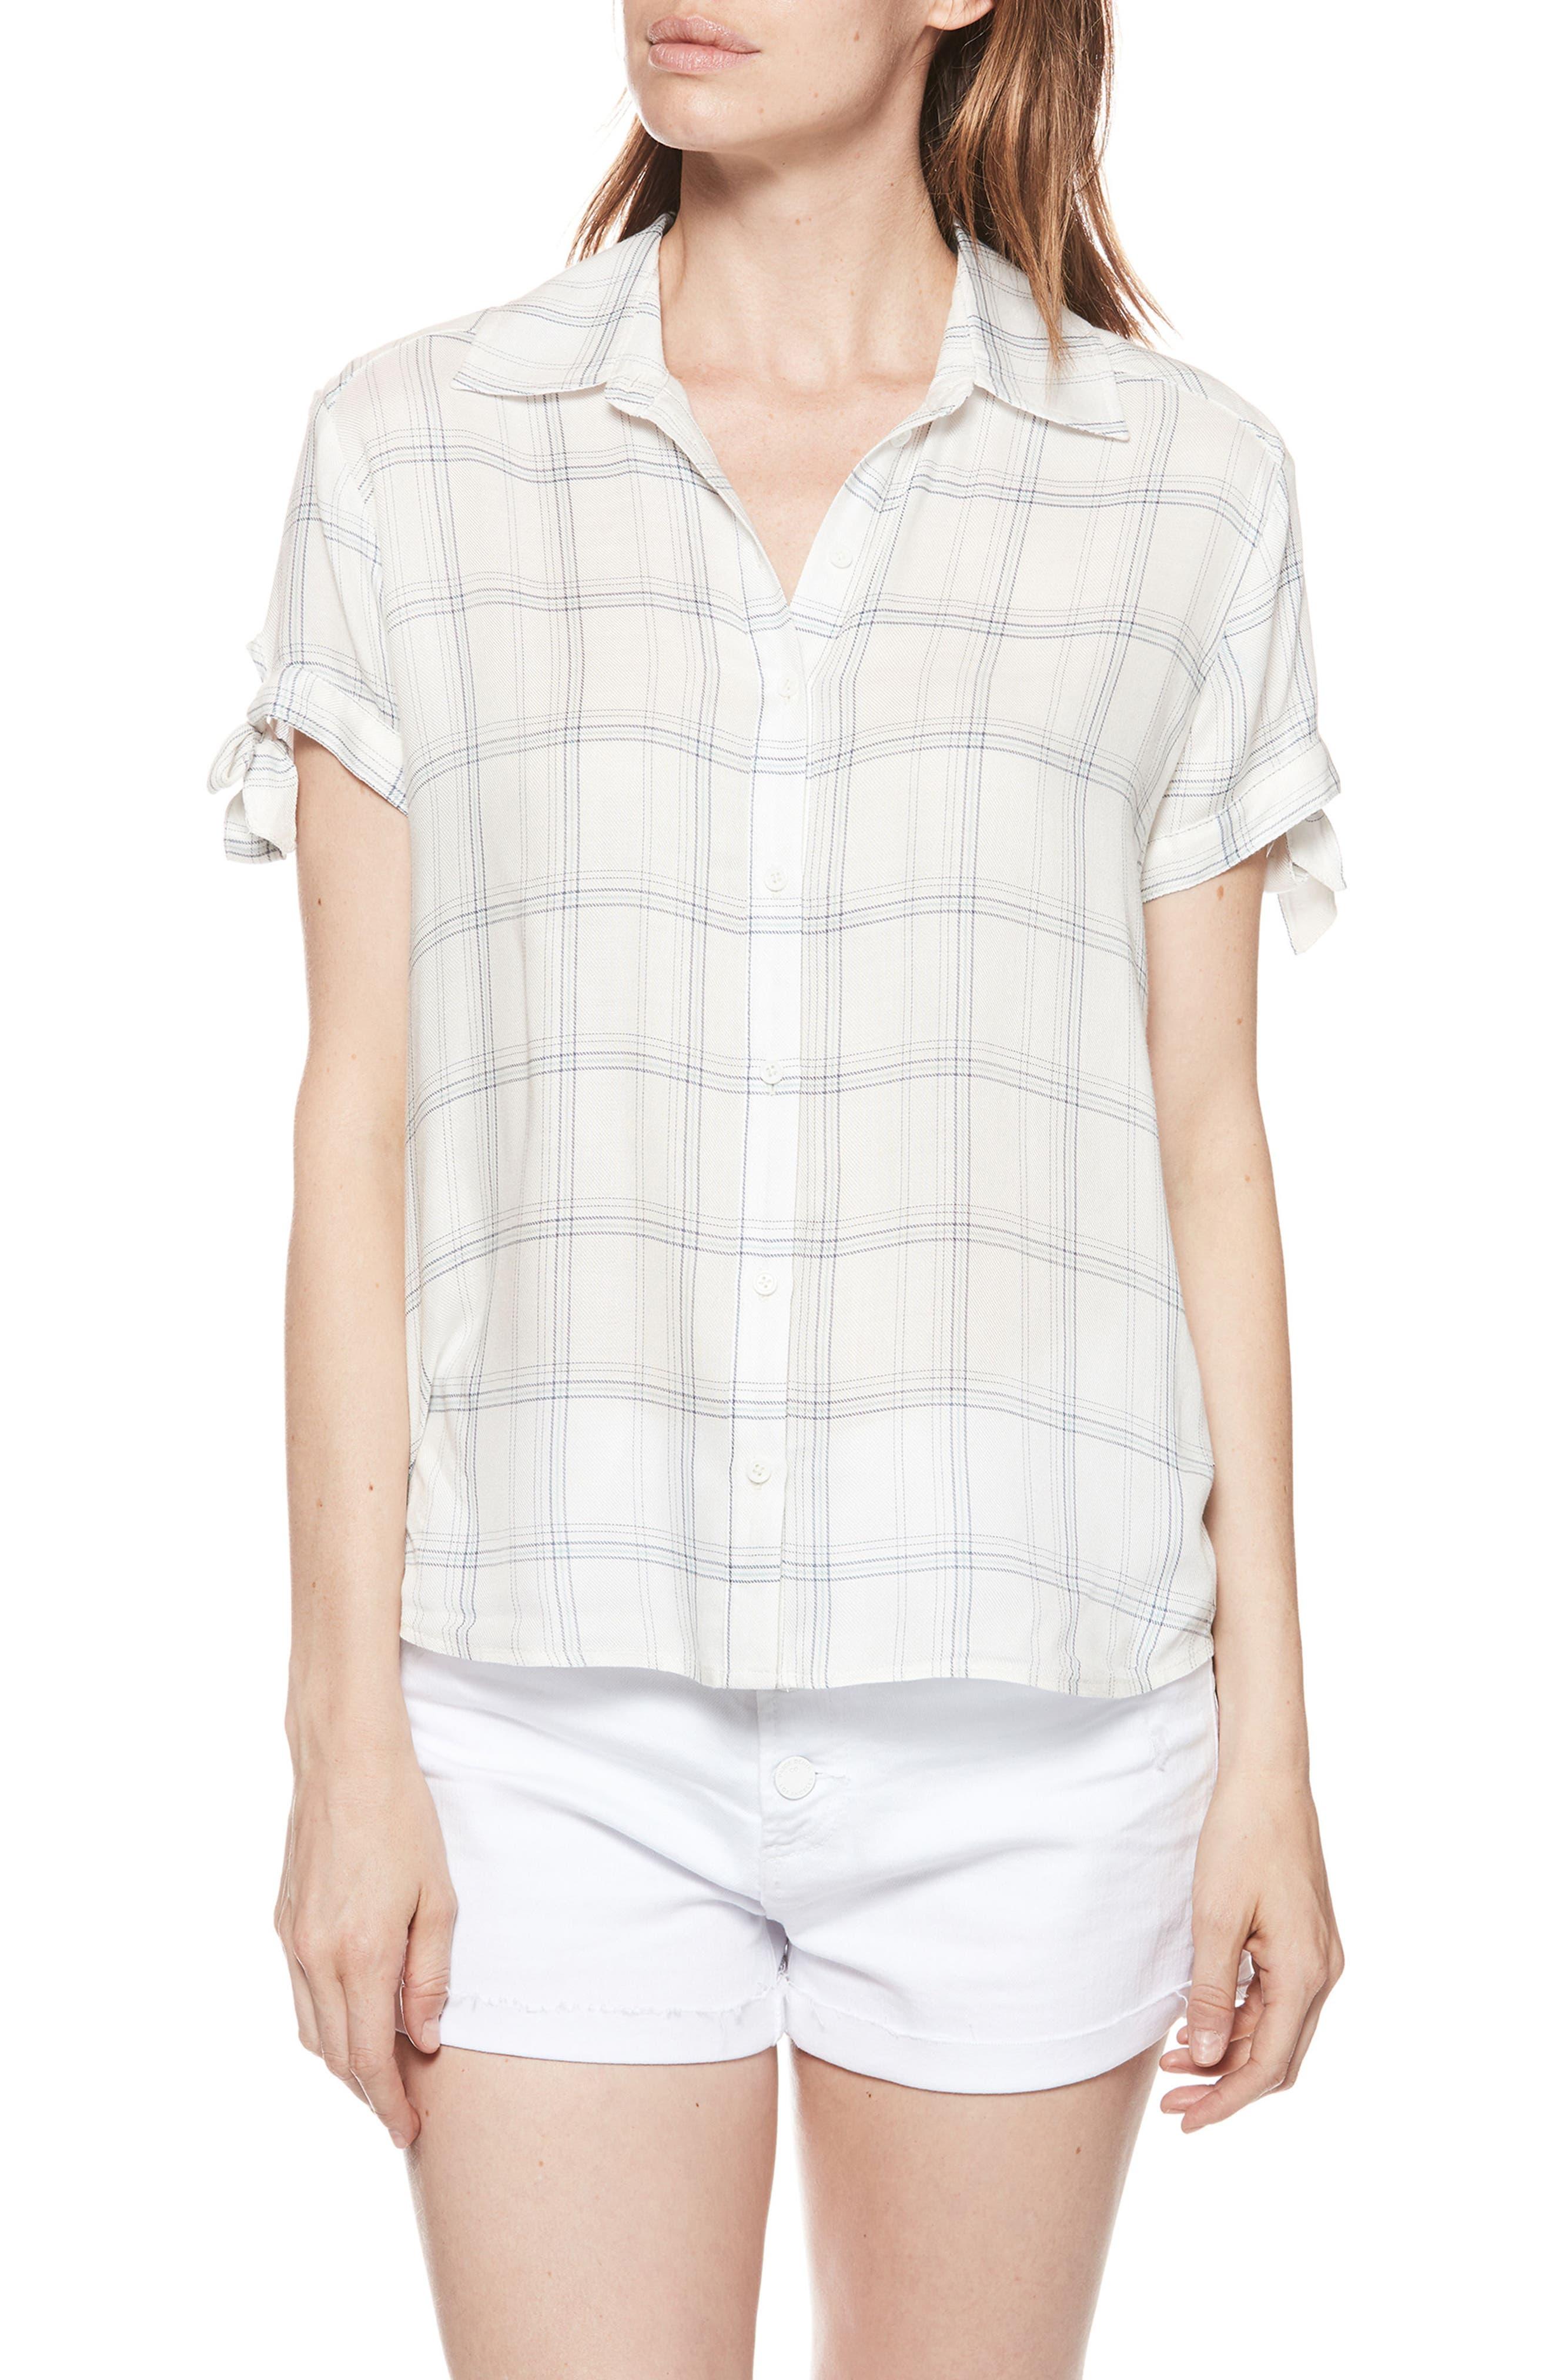 Avery Plaid Shirt,                         Main,                         color, WHITE / BIJOU BLUE